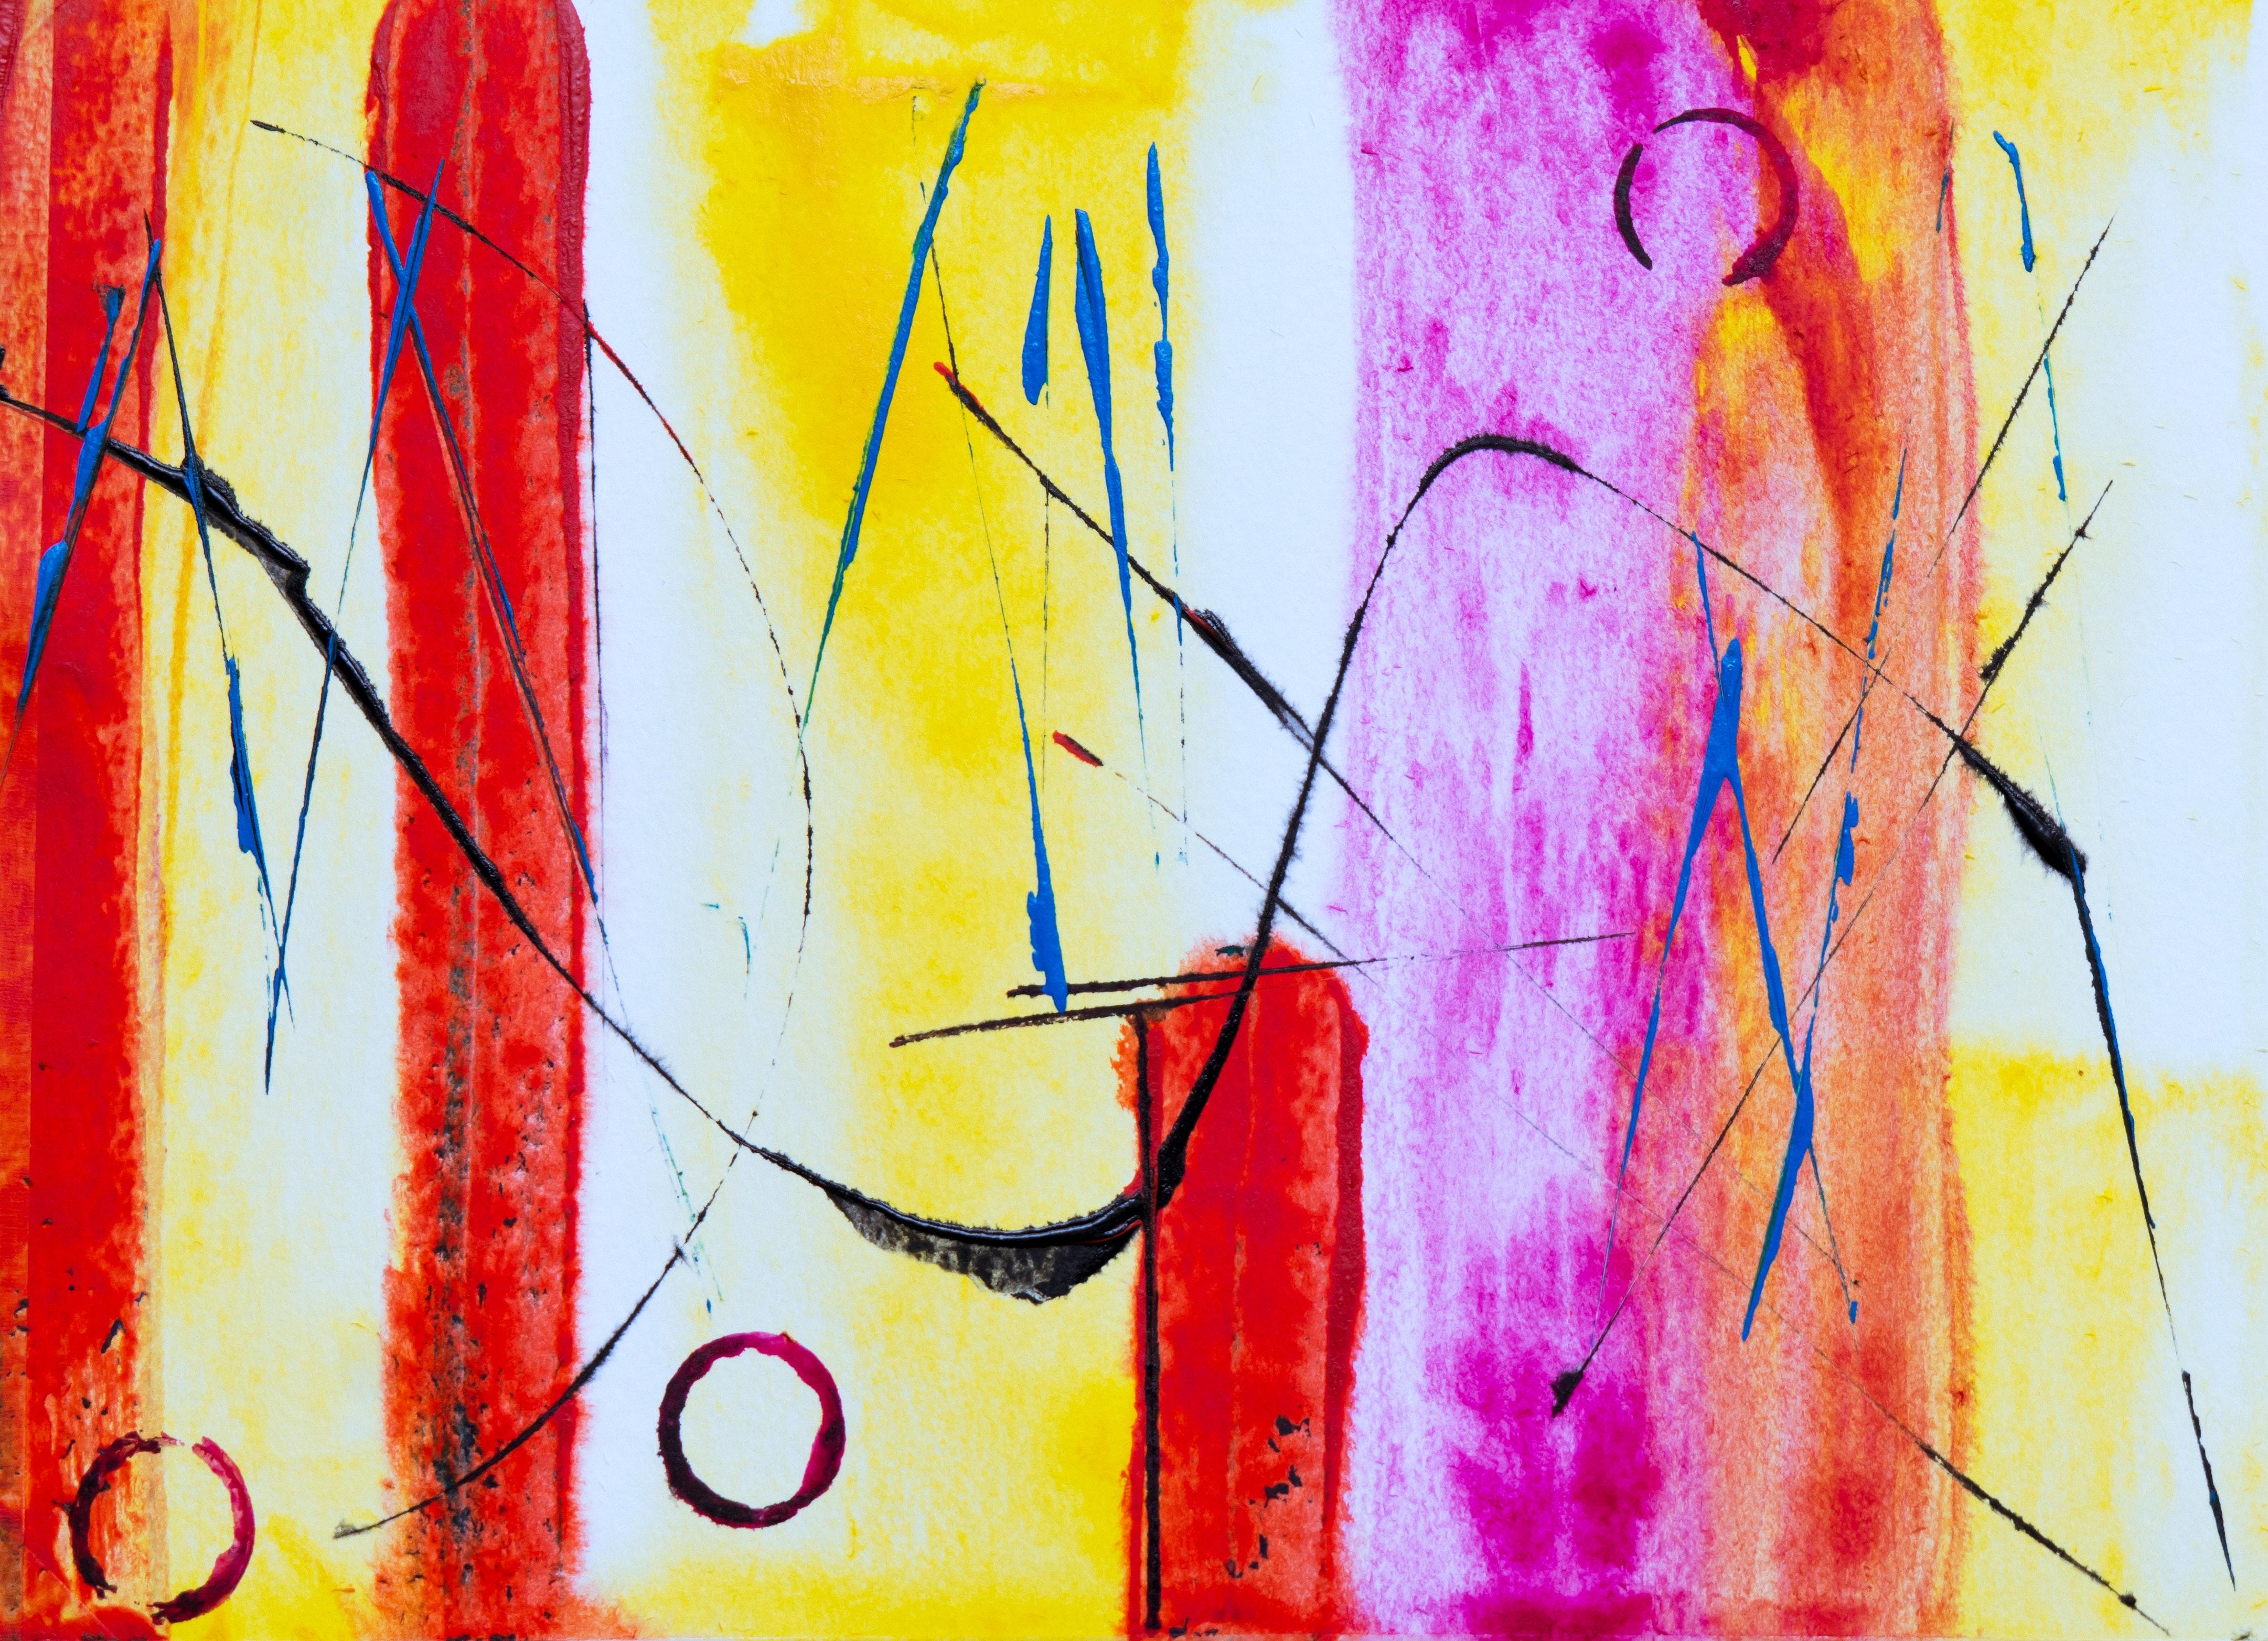 54 Gambar Abstrak Ekspresionisme